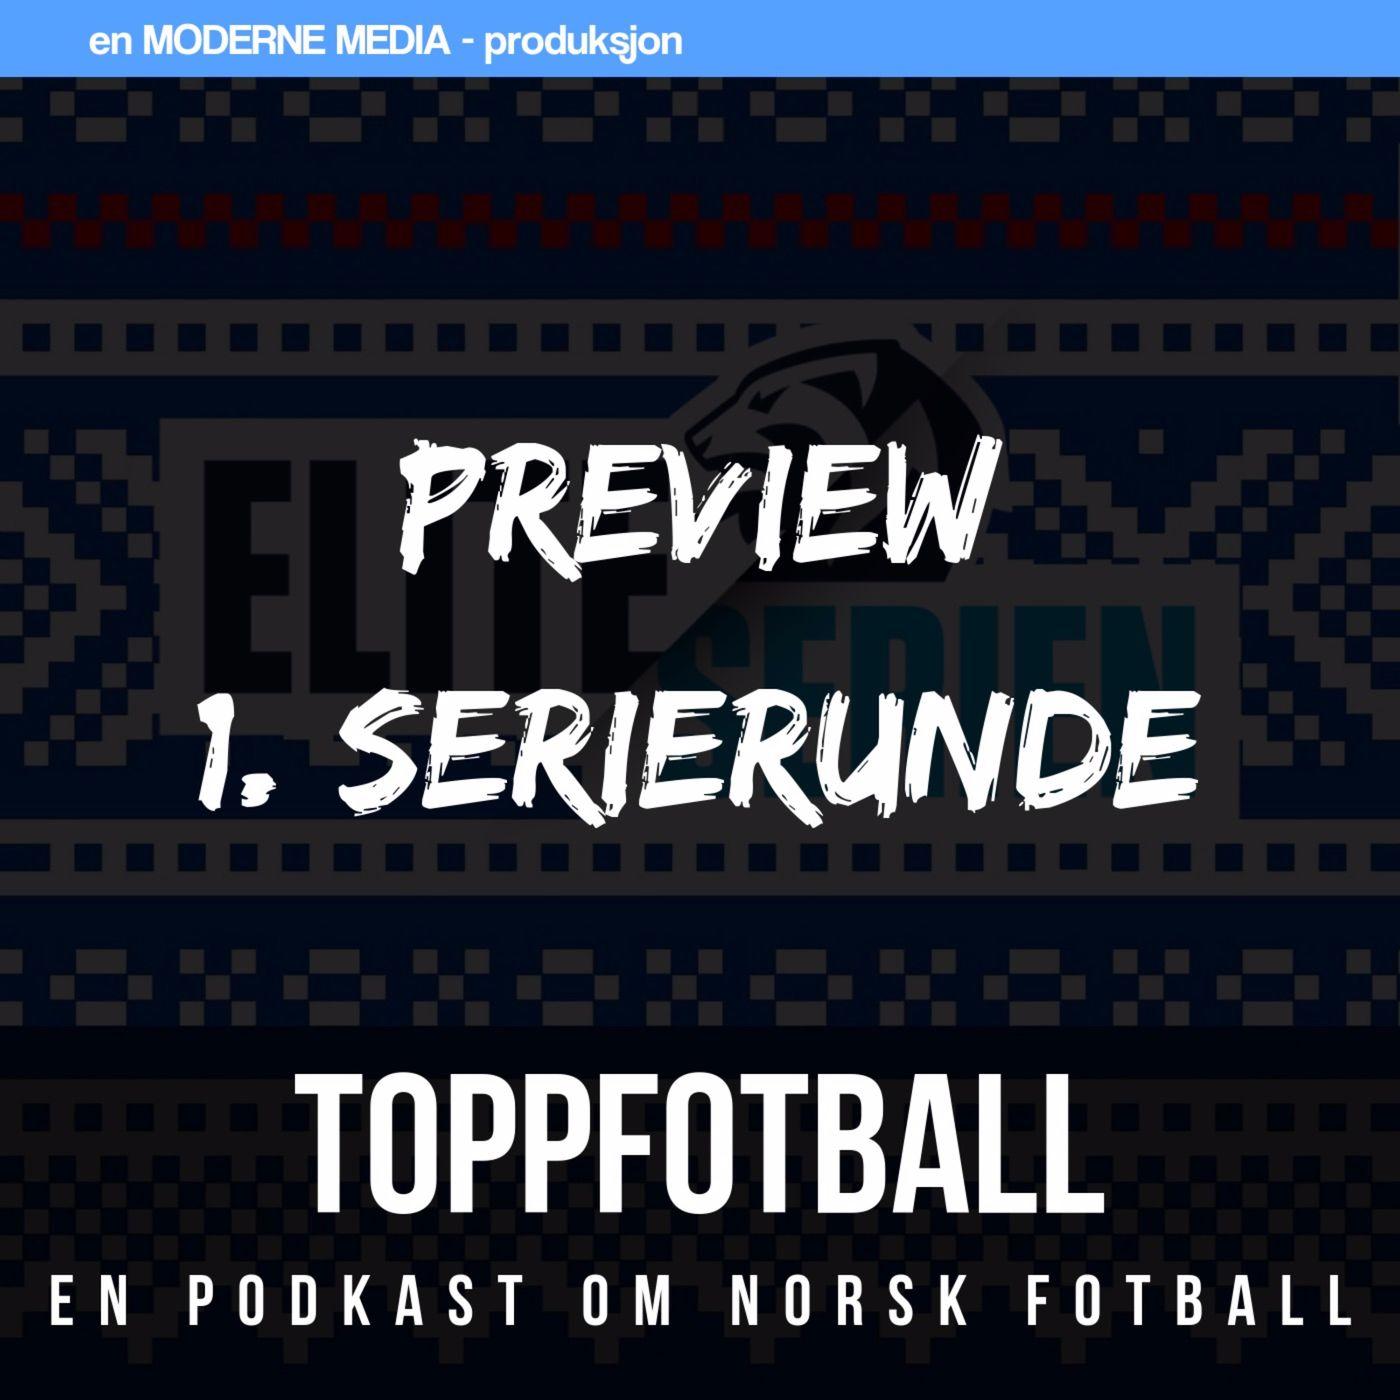 Episode 125 - Preview til 1. serierunde i Eliteserien 2019